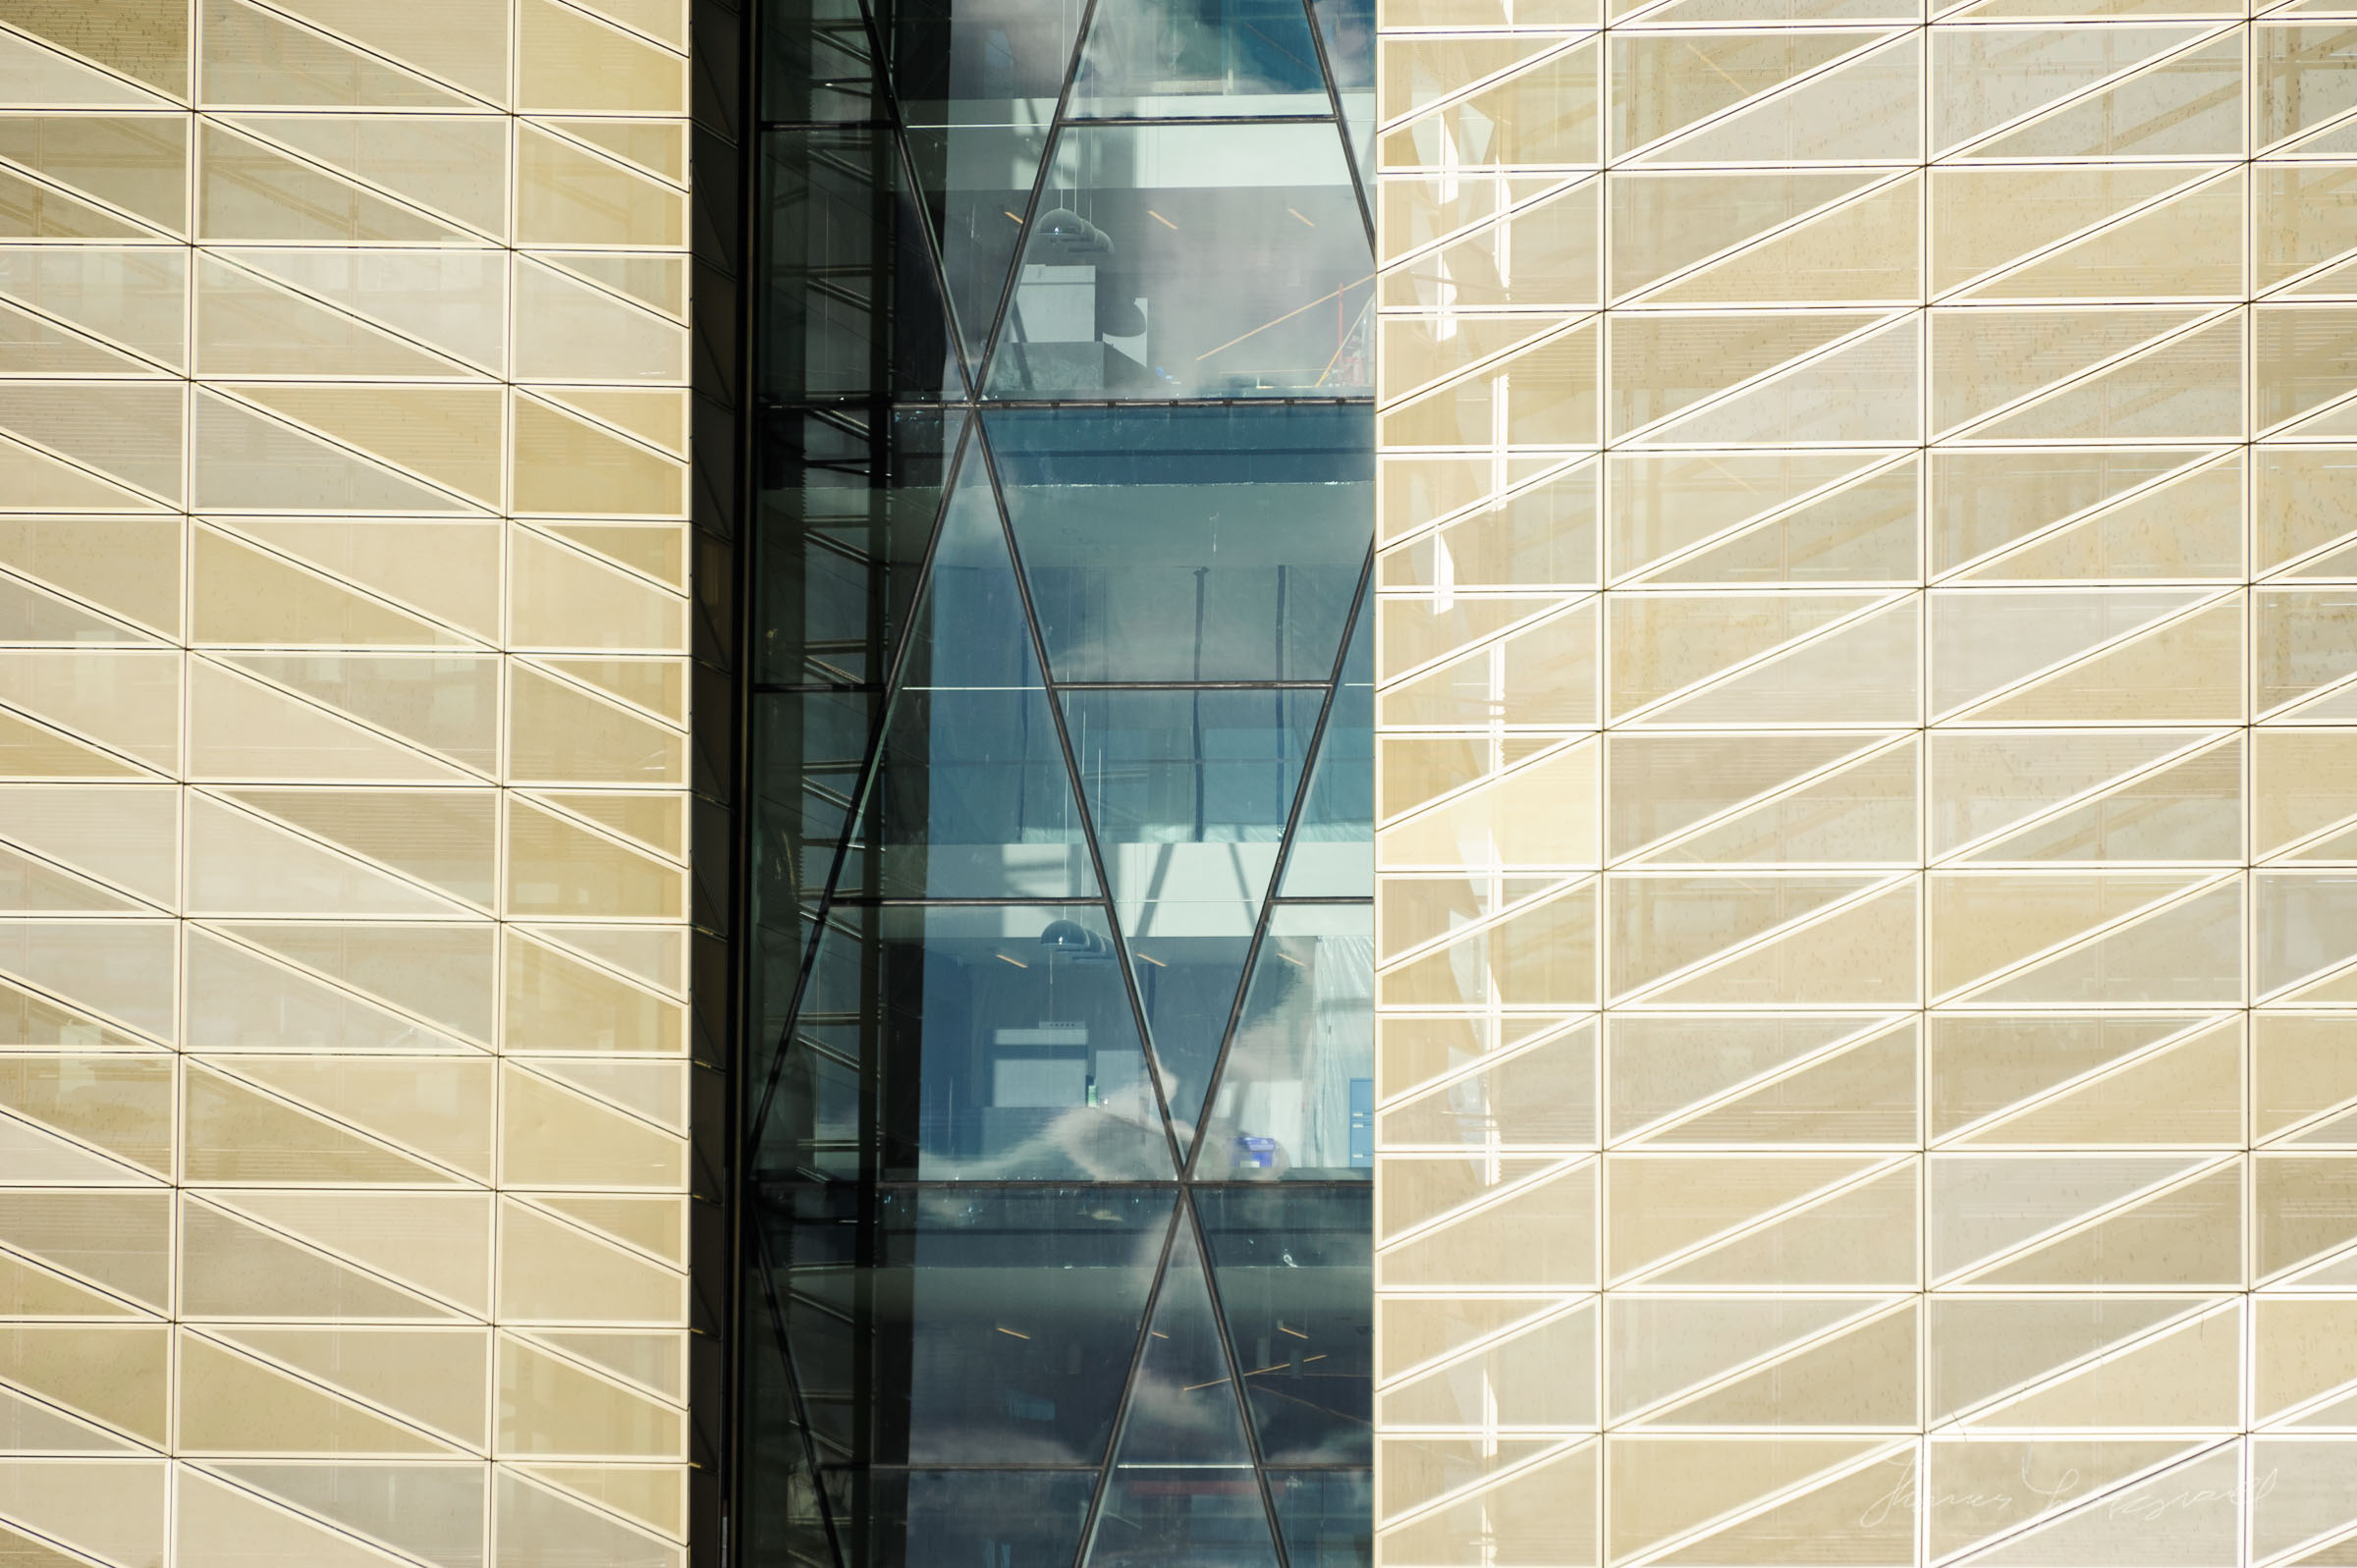 Dublin's New Central Bank Building